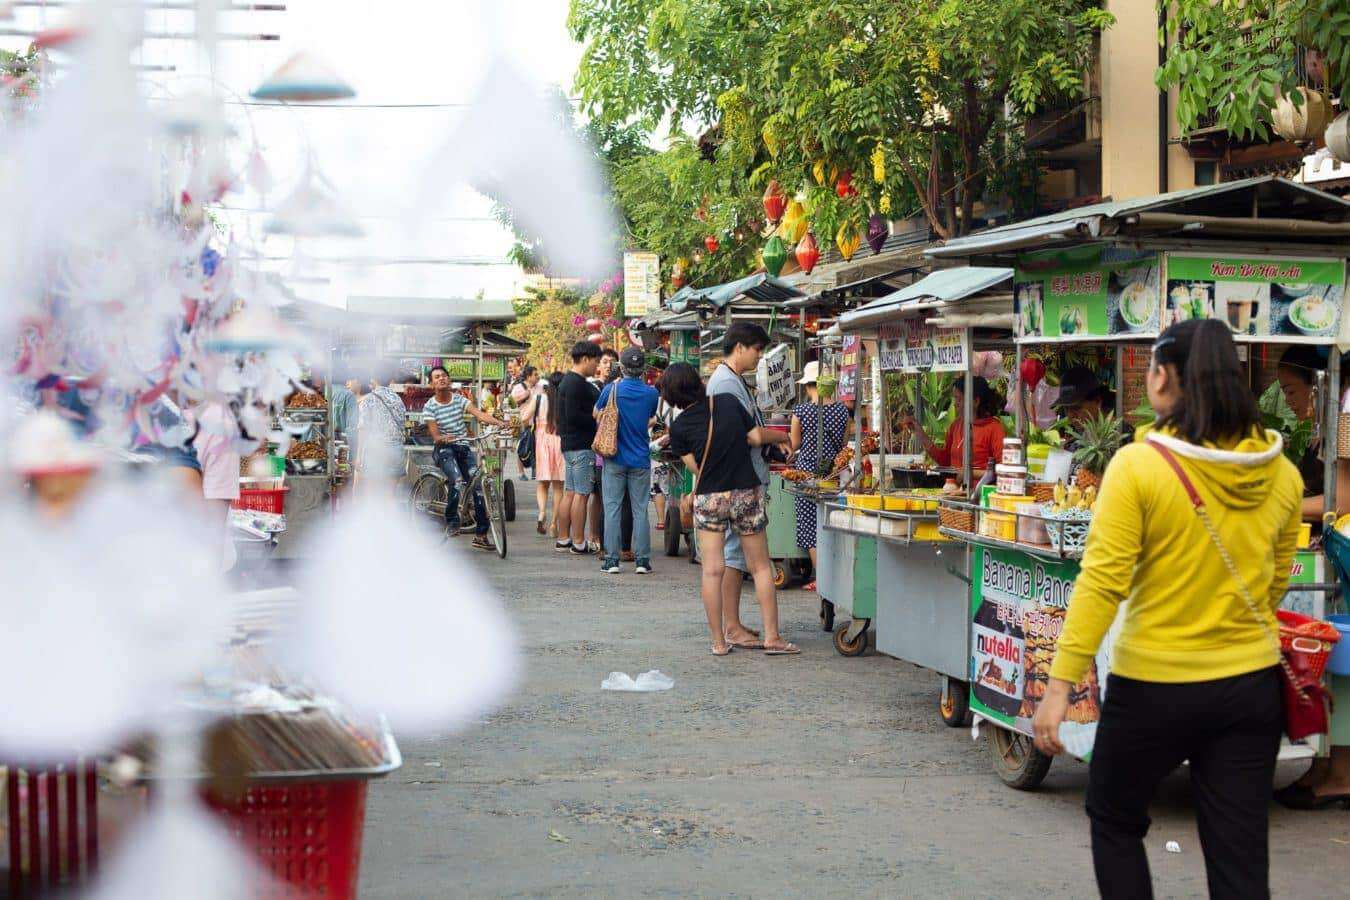 Dusk settles - Hoi An's markets